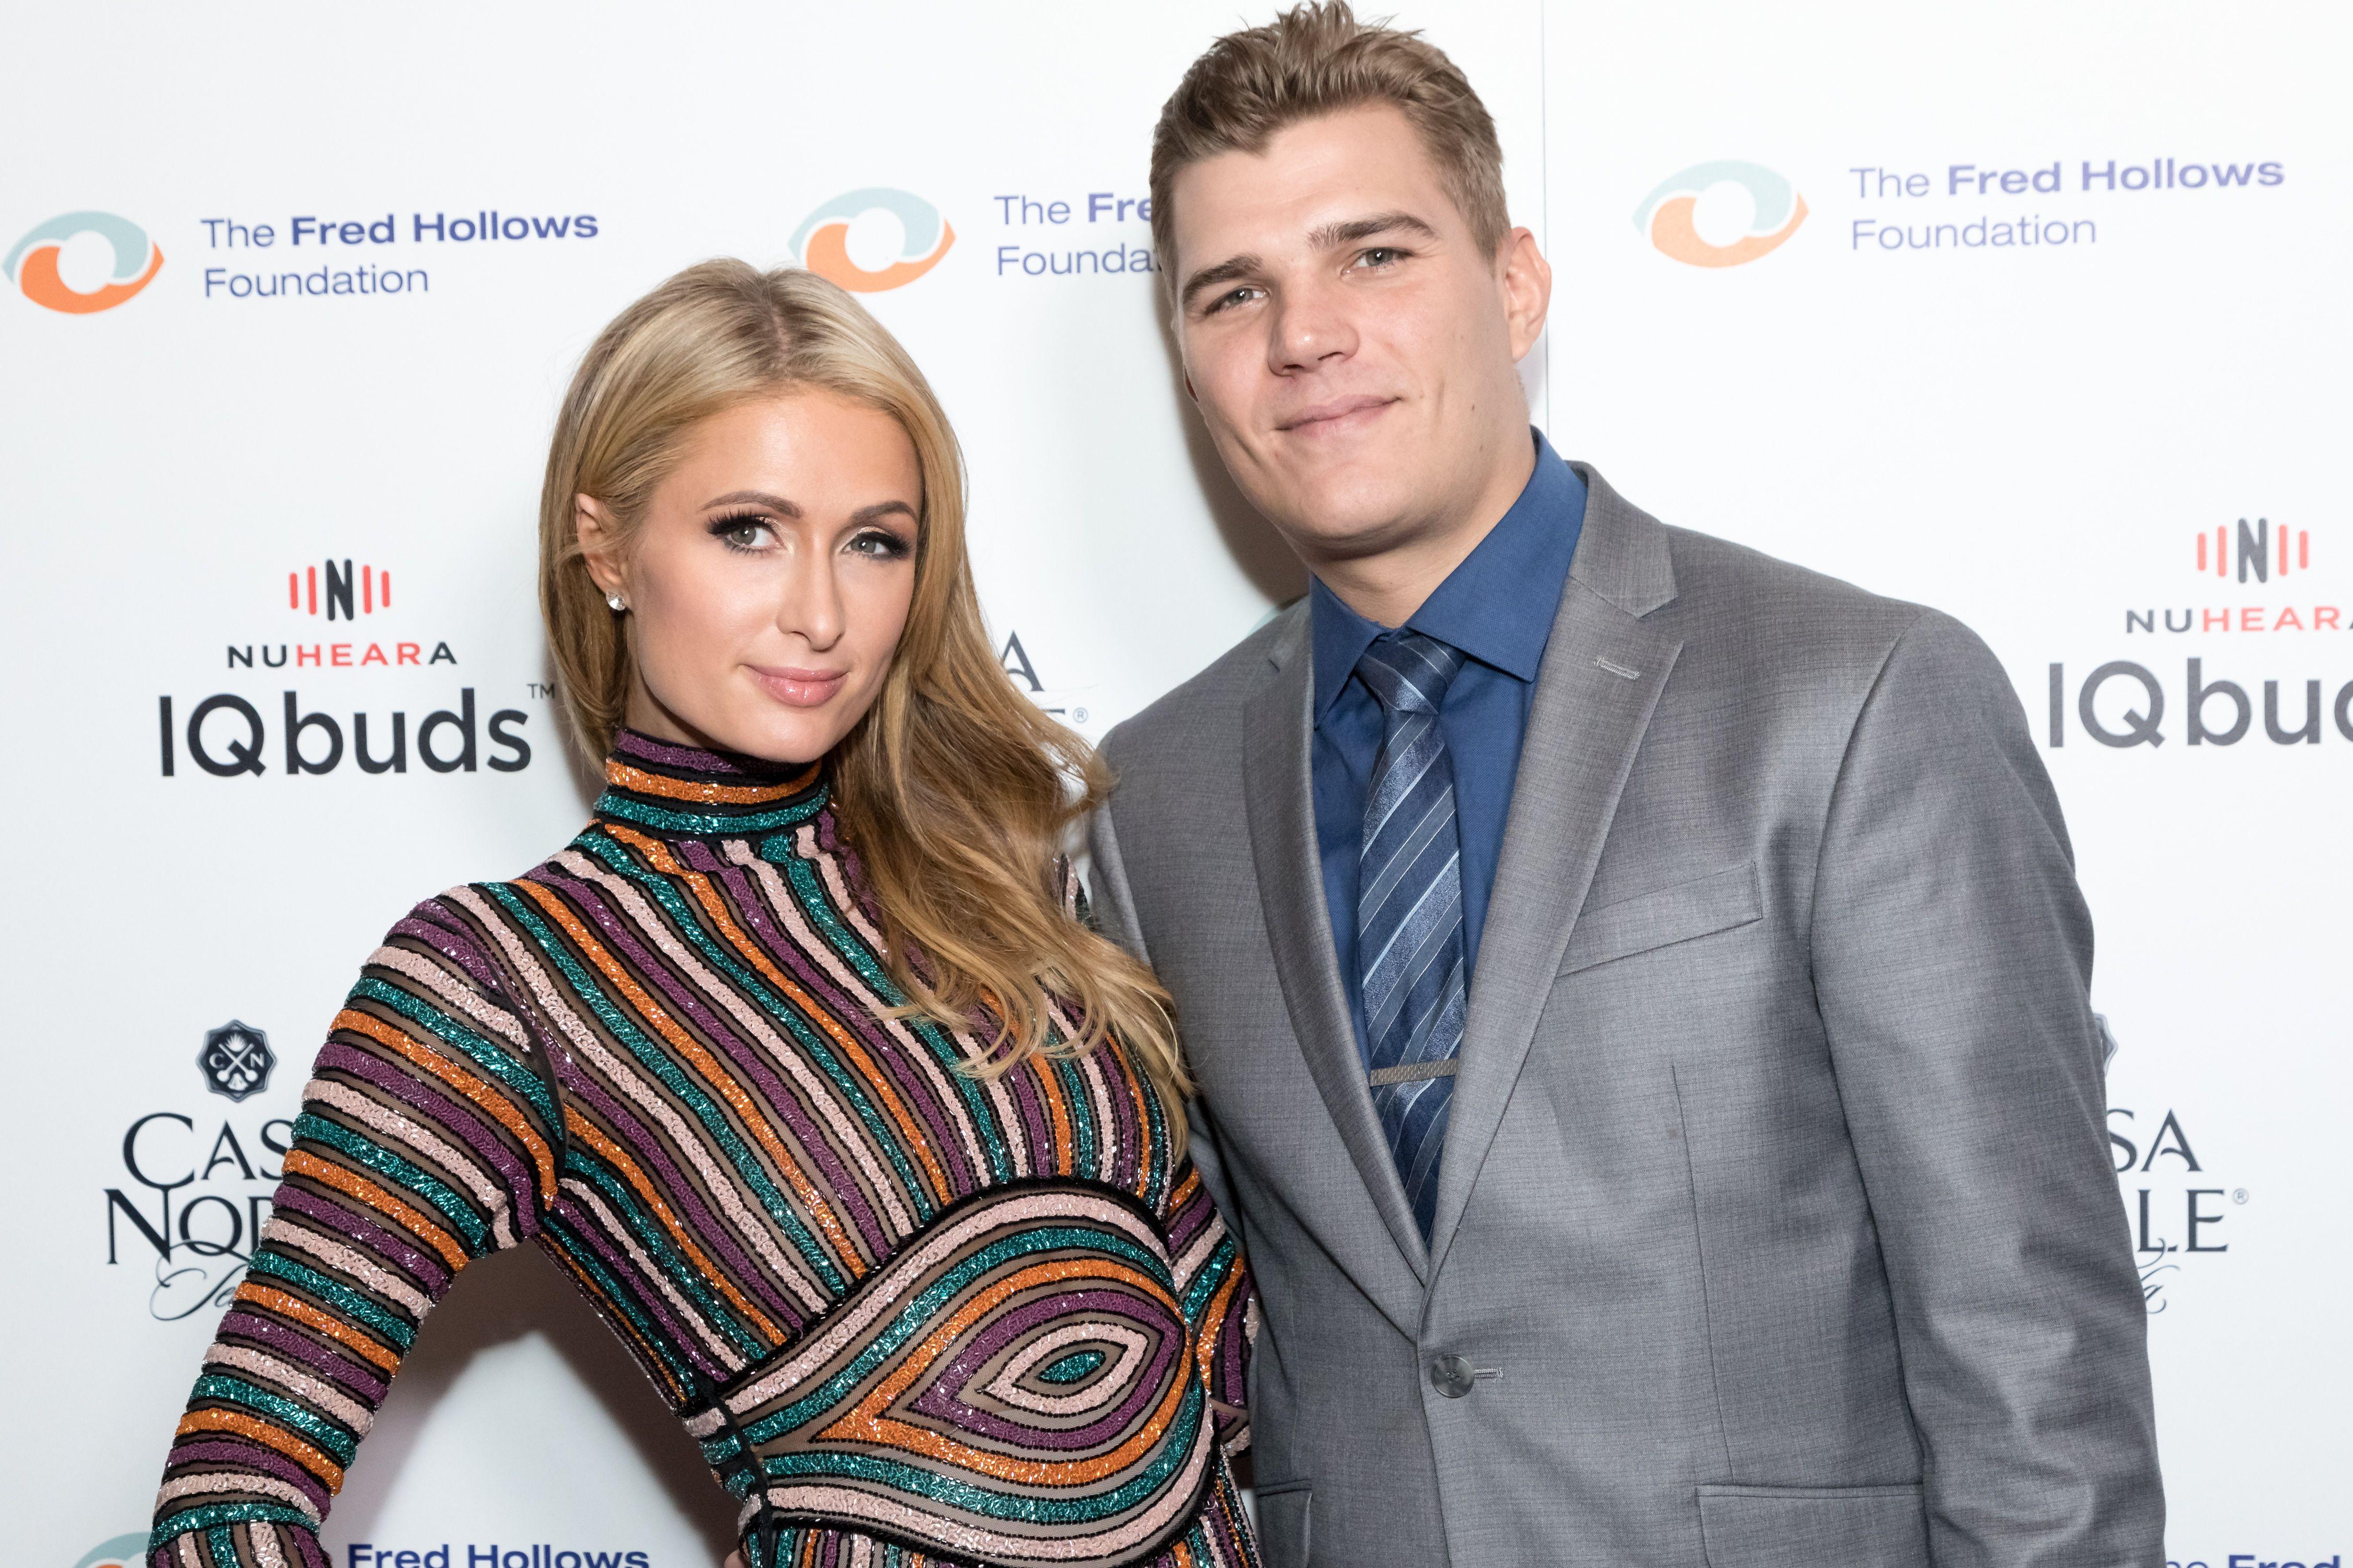 Communication on this topic: Paris Hilton Just Announced Shes Engaged to , paris-hilton-just-announced-shes-engaged-to/